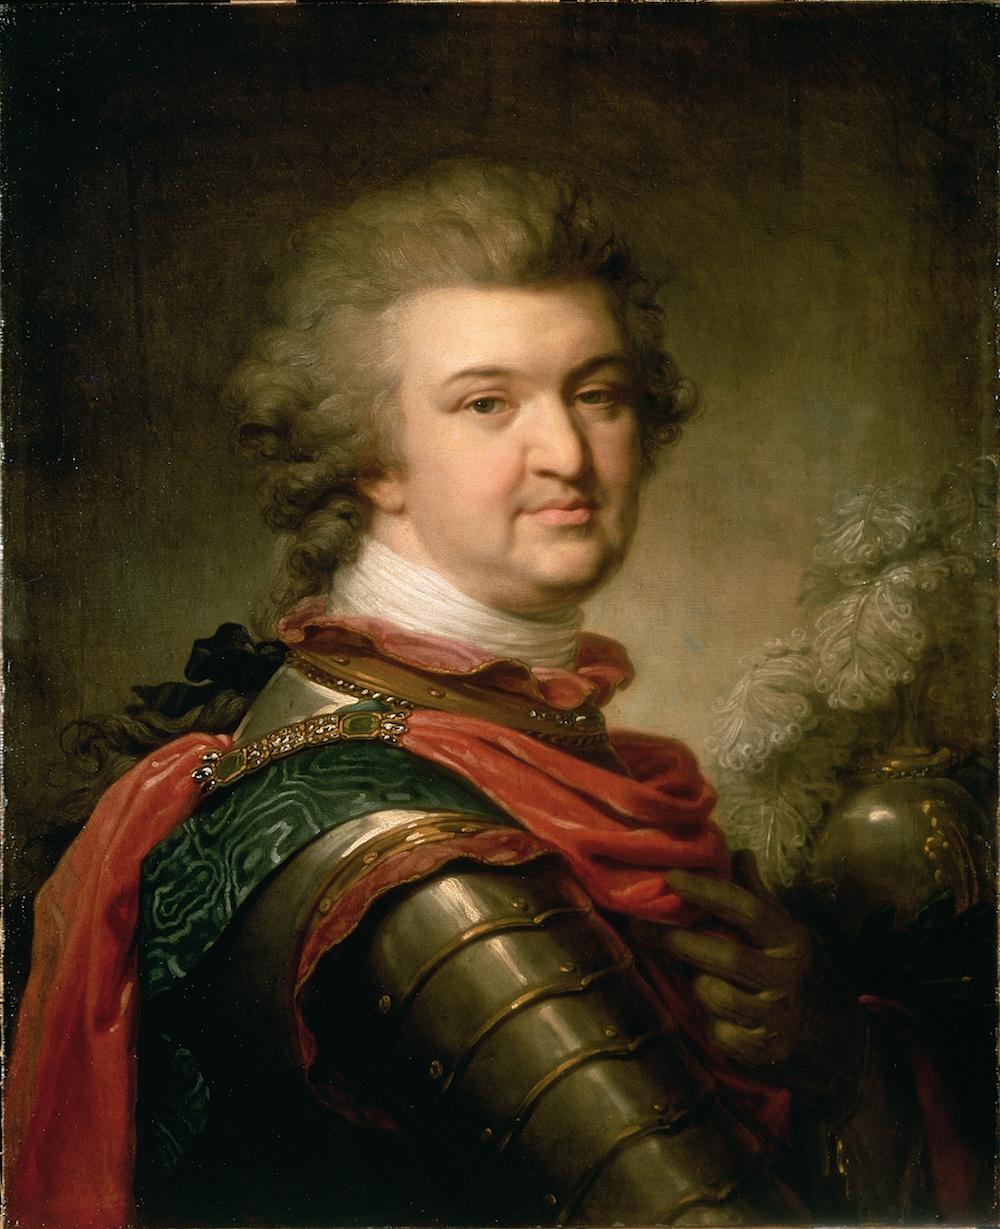 Portrait of Prince Gregory Potemkin ©1790, Johann Baptist Lampi / Hermitage, St. Petersburg, Russia / Bridgeman Images